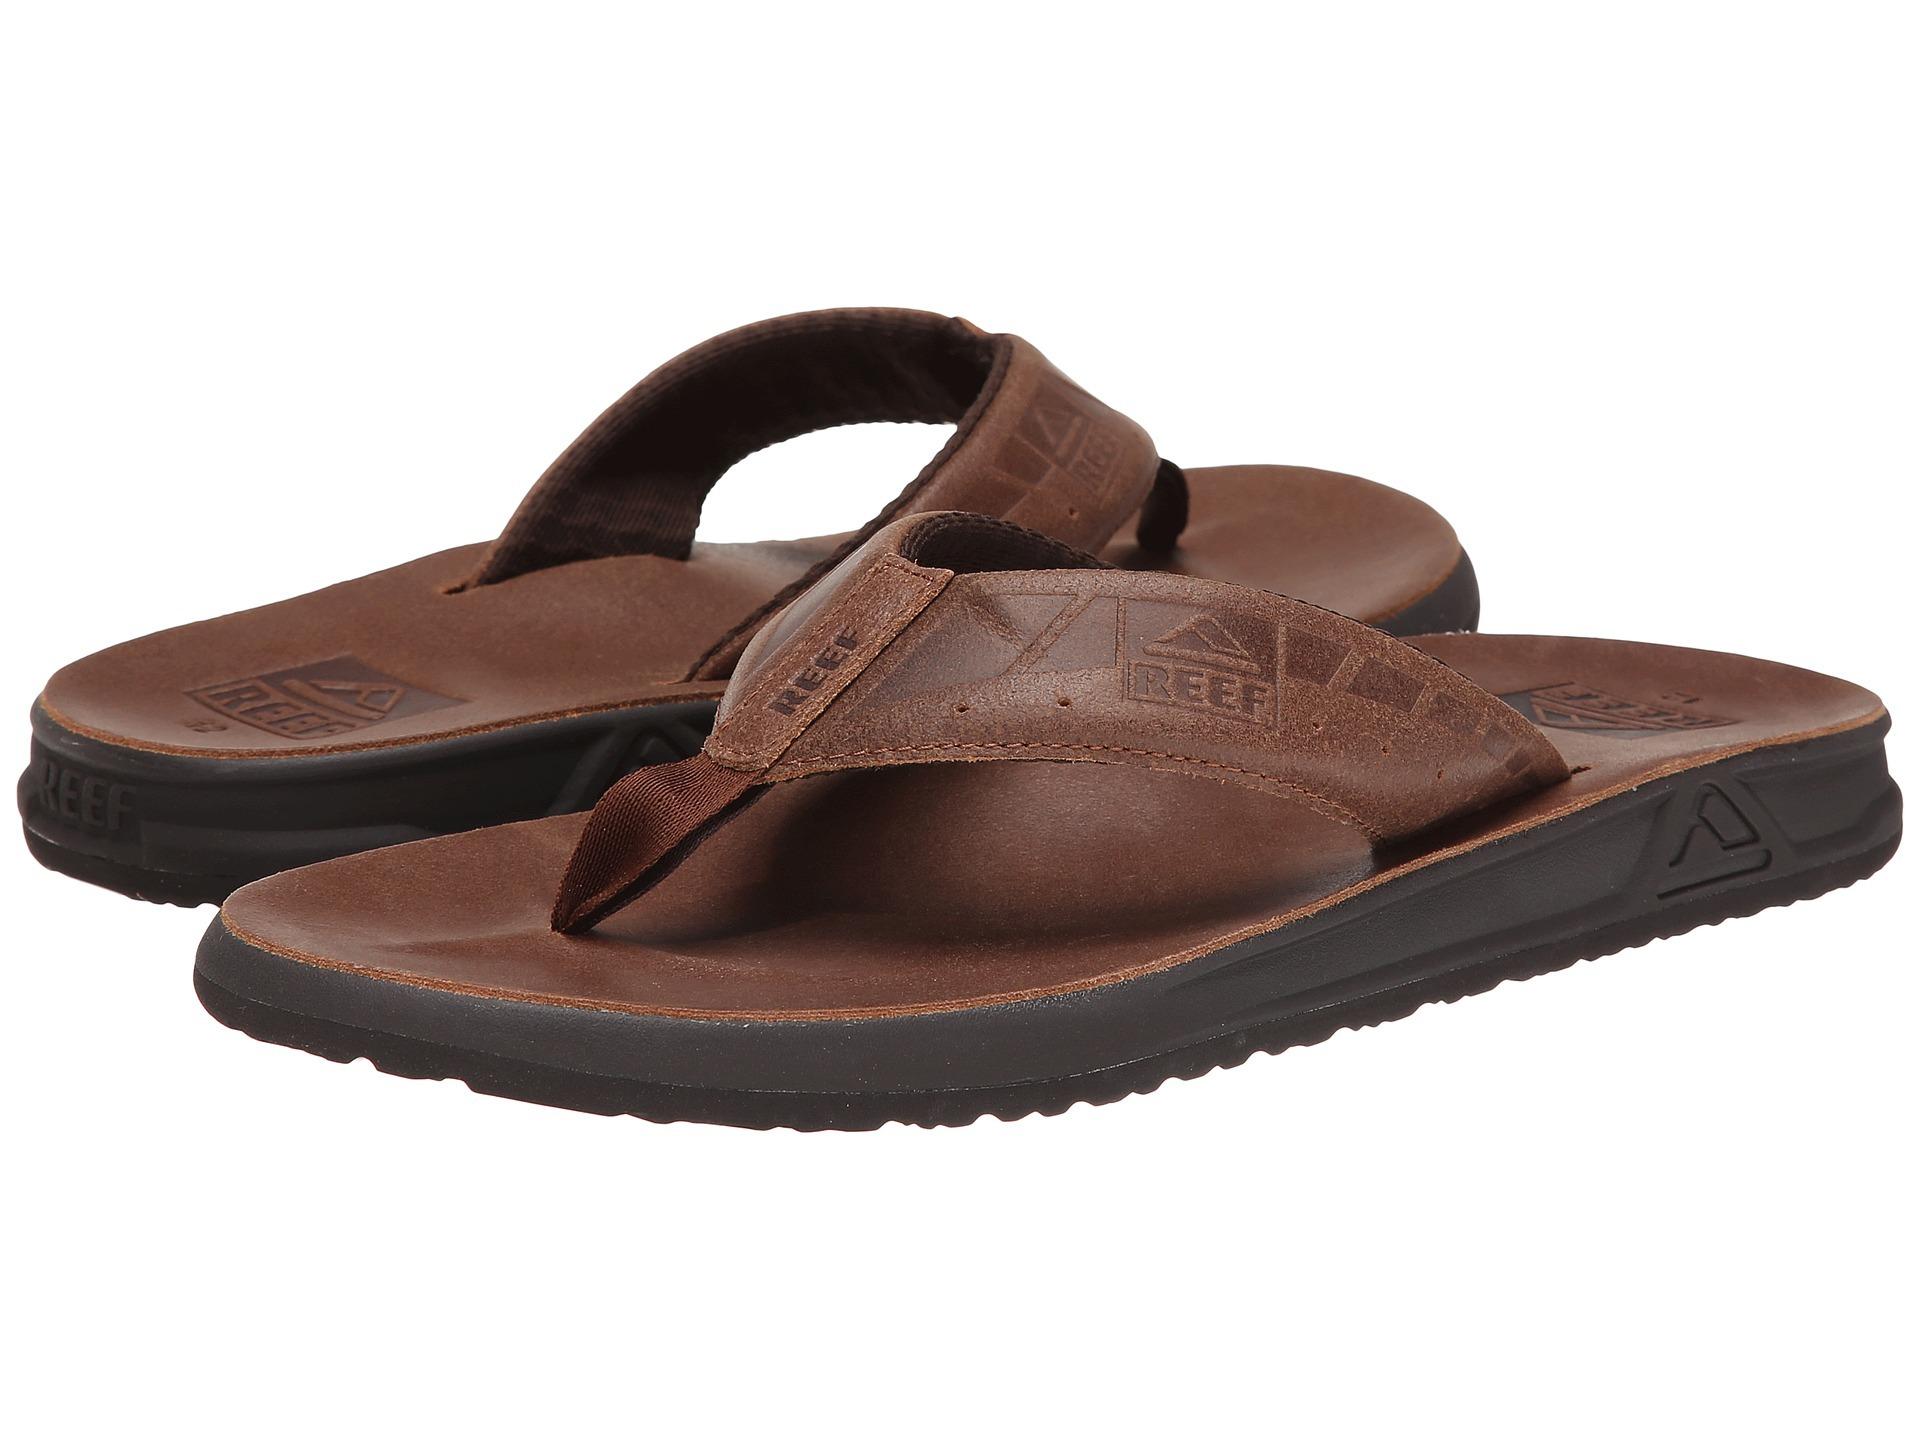 2d93e2b35f6 Footwear · Mens · Sandals   FlipFlops · Phantom Ultimate ...